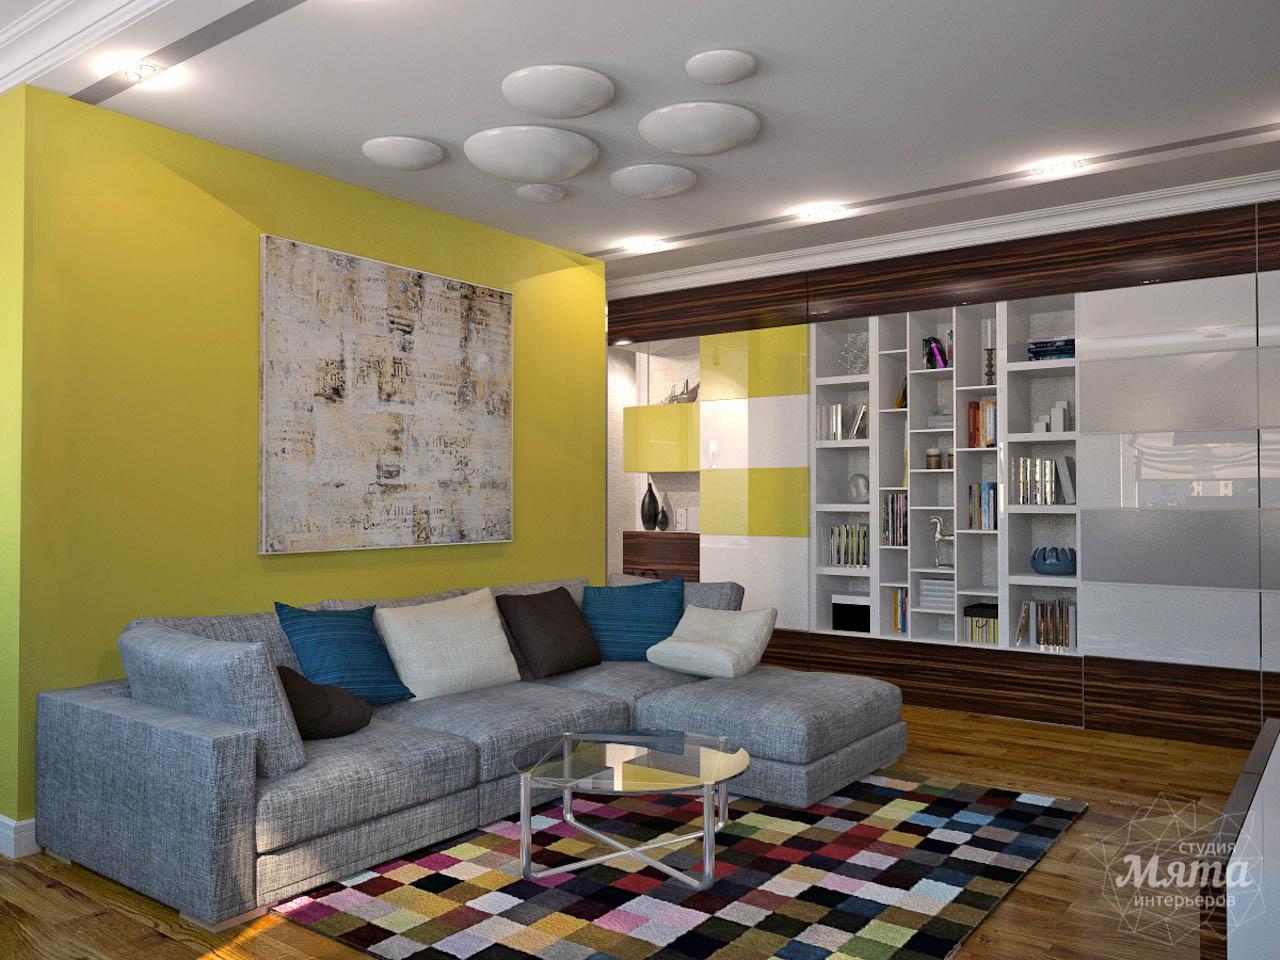 стиль авангард в интерьере дома